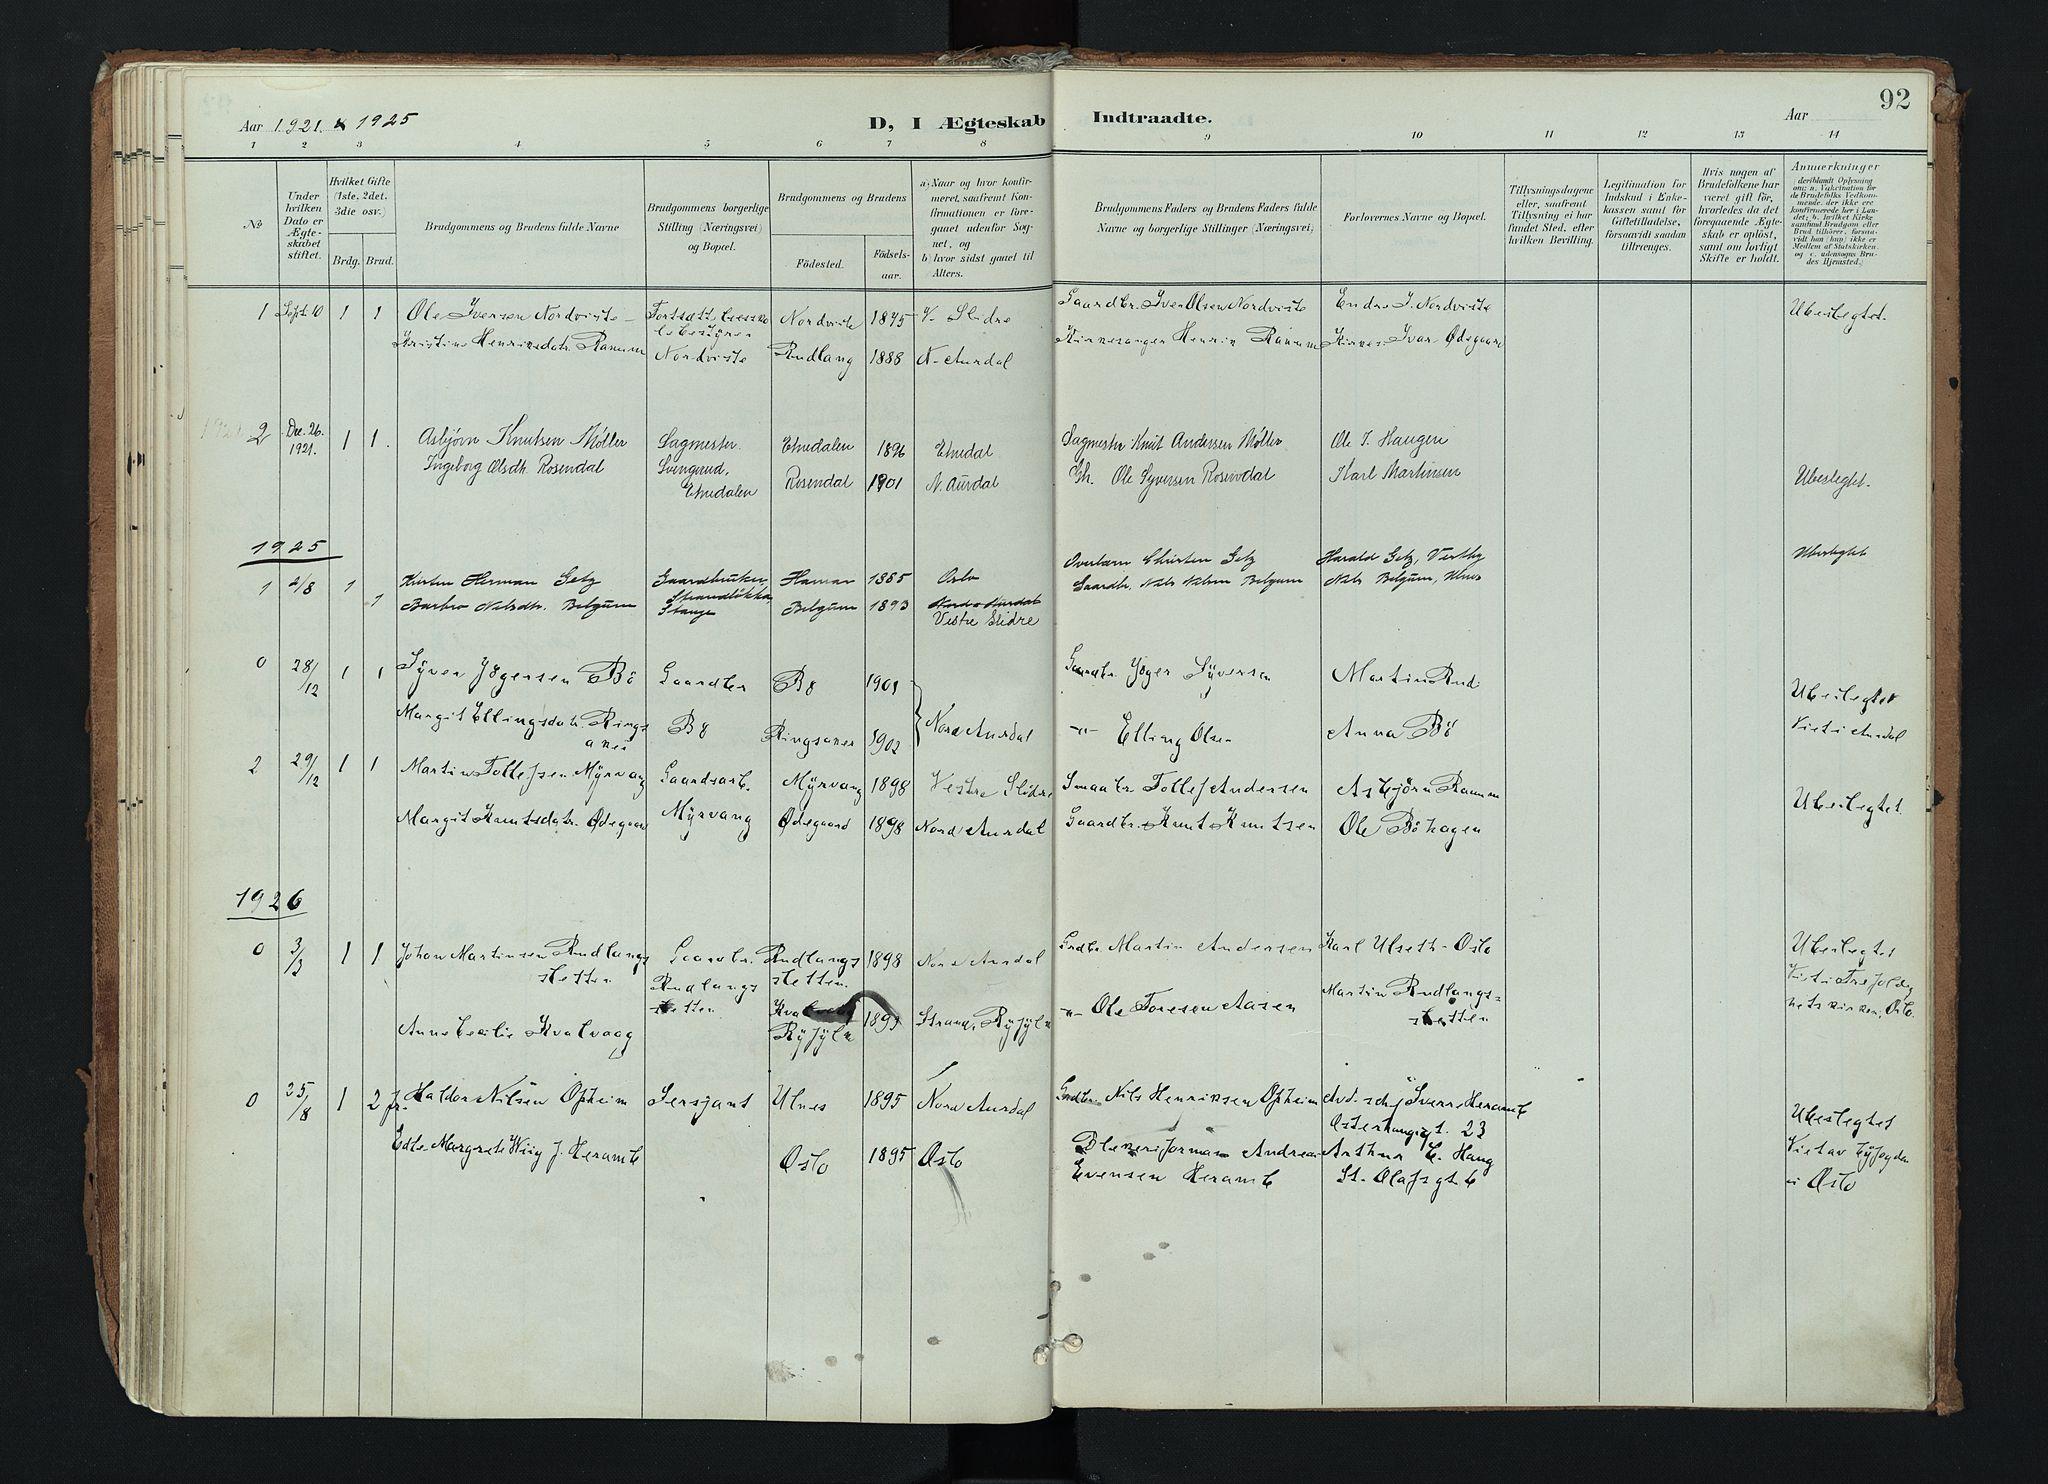 SAH, Nord-Aurdal prestekontor, Ministerialbok nr. 17, 1897-1926, s. 92